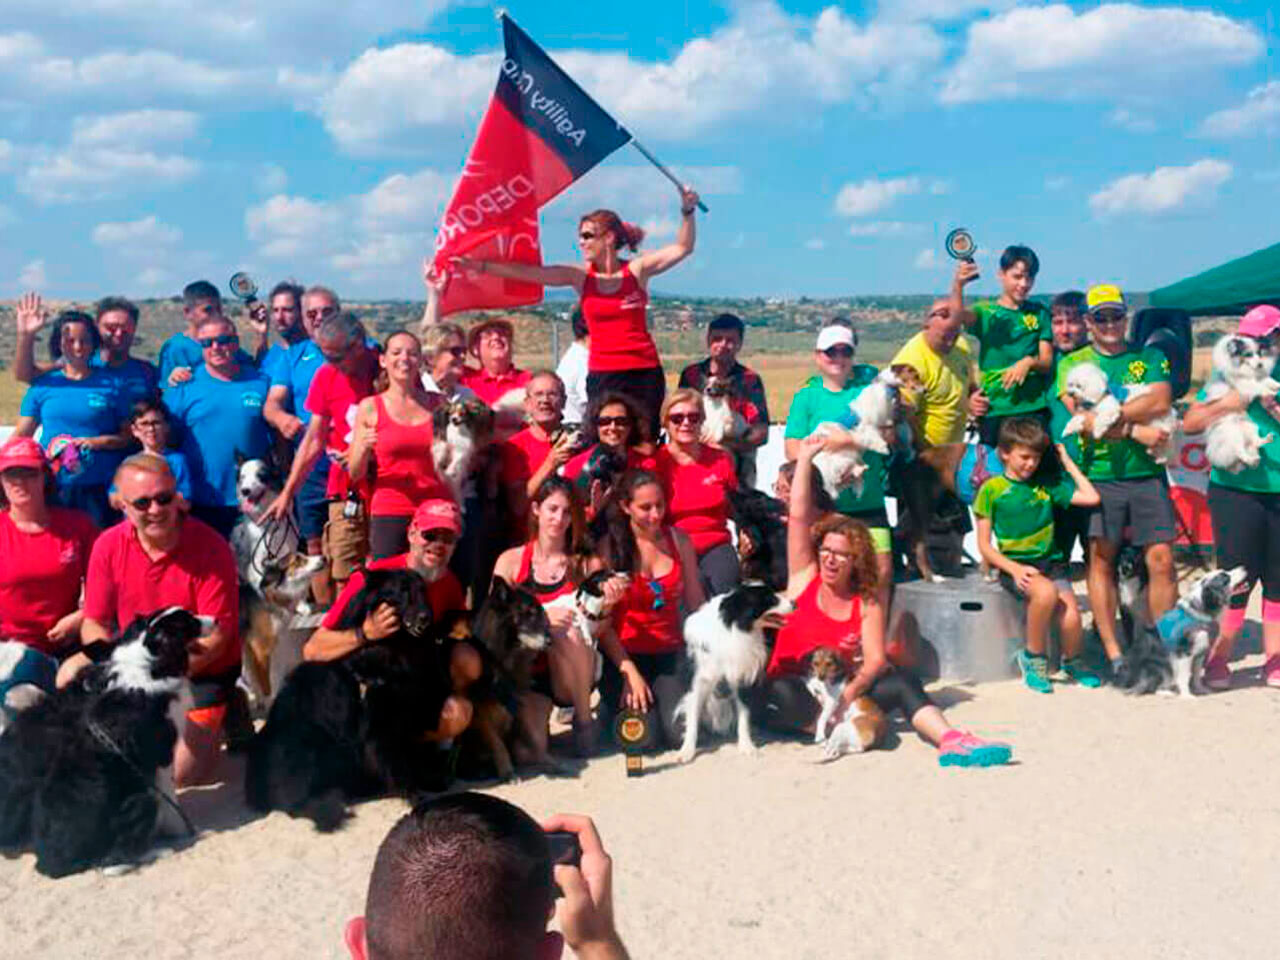 III Campeonato Autonómico Liga Agility 2018 - Equipos